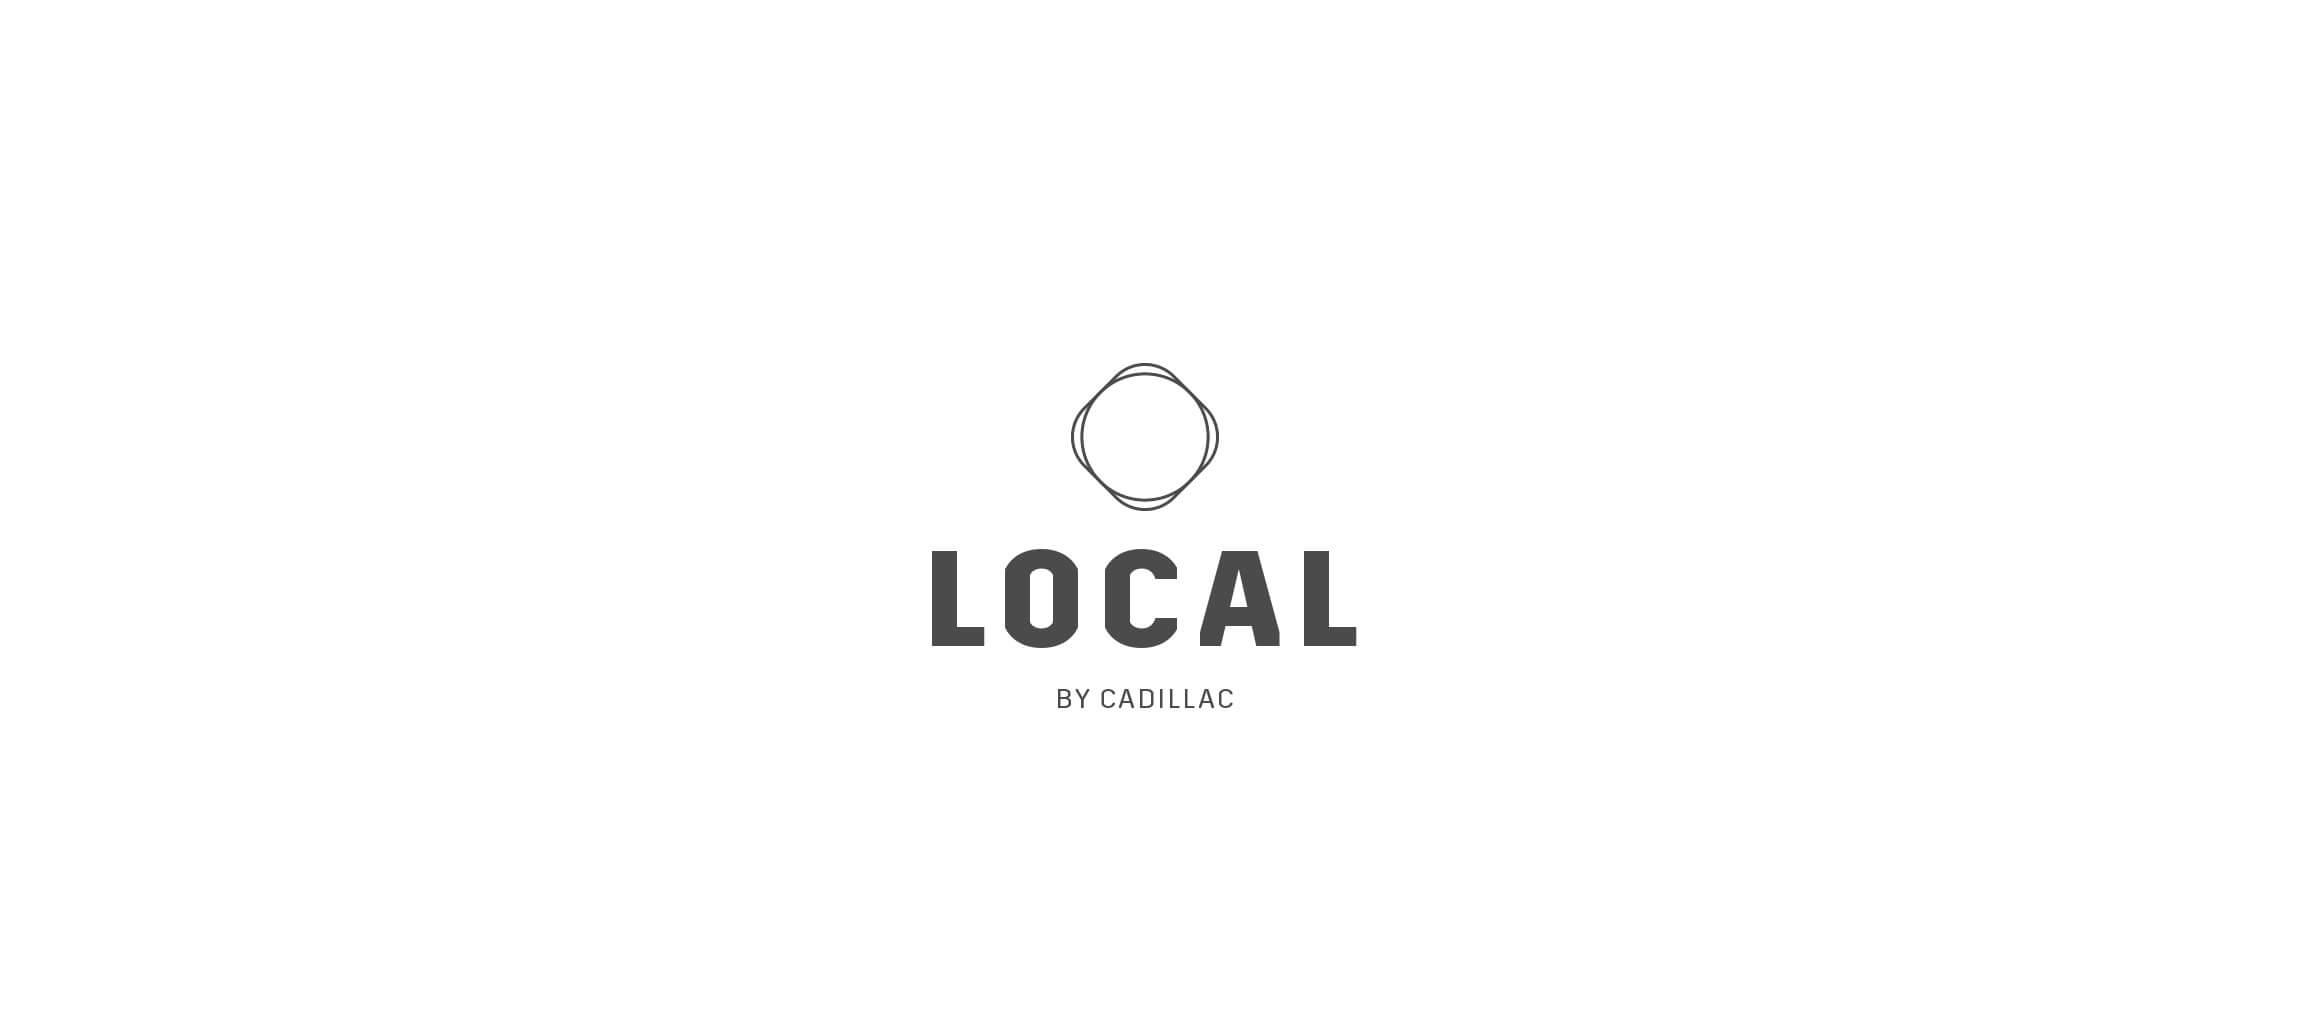 cadillac-local-2_01